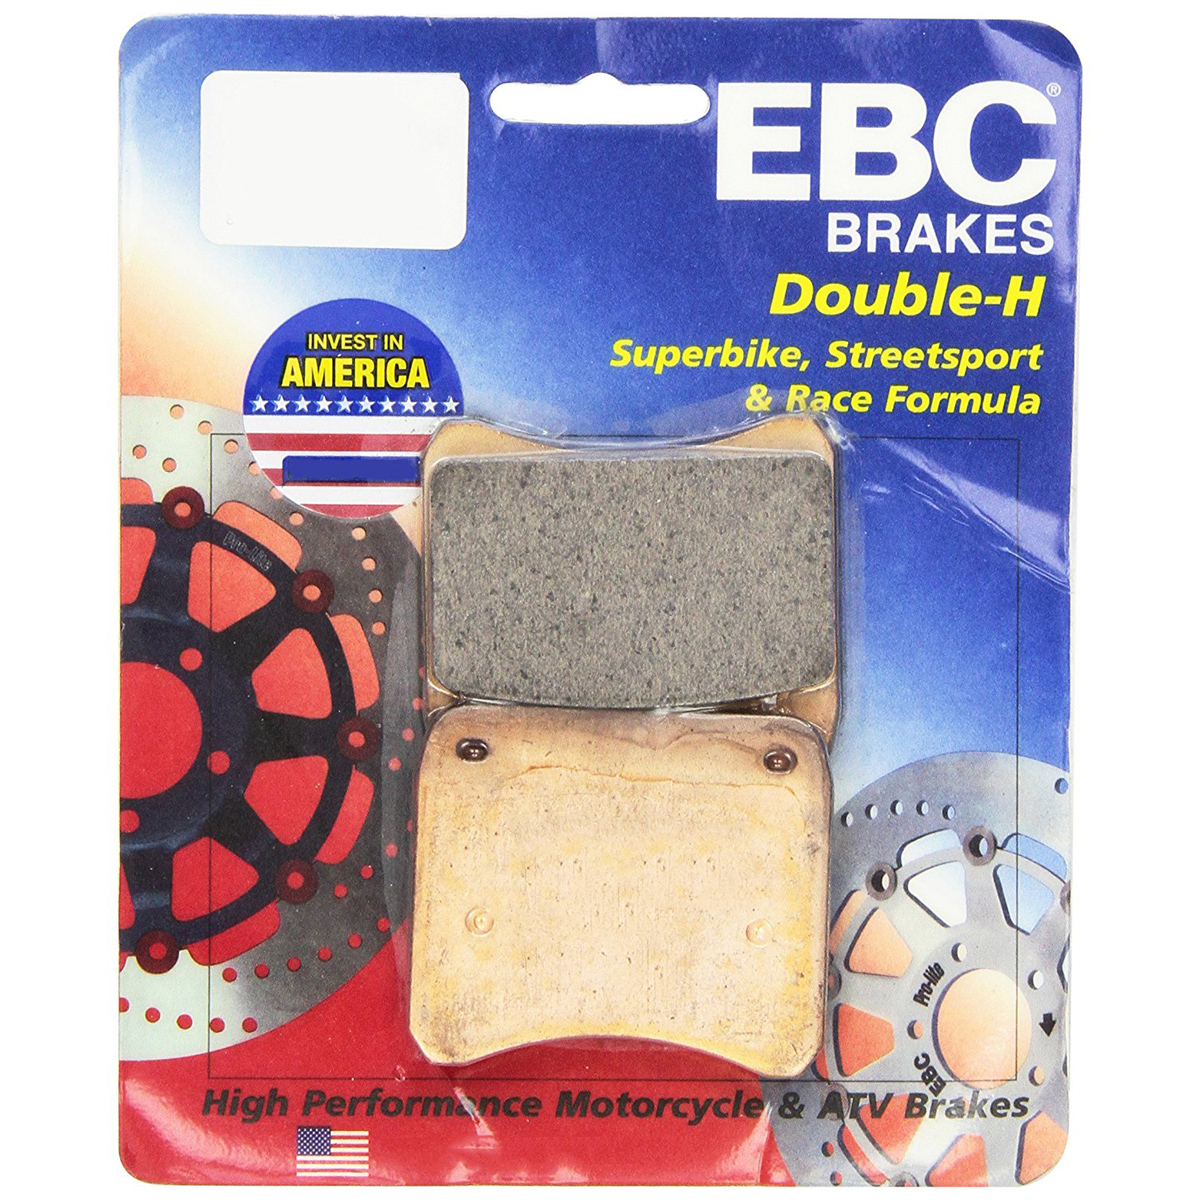 EBC Double-H HH Sintered Superbike Brake Pads FA629HH One Pair